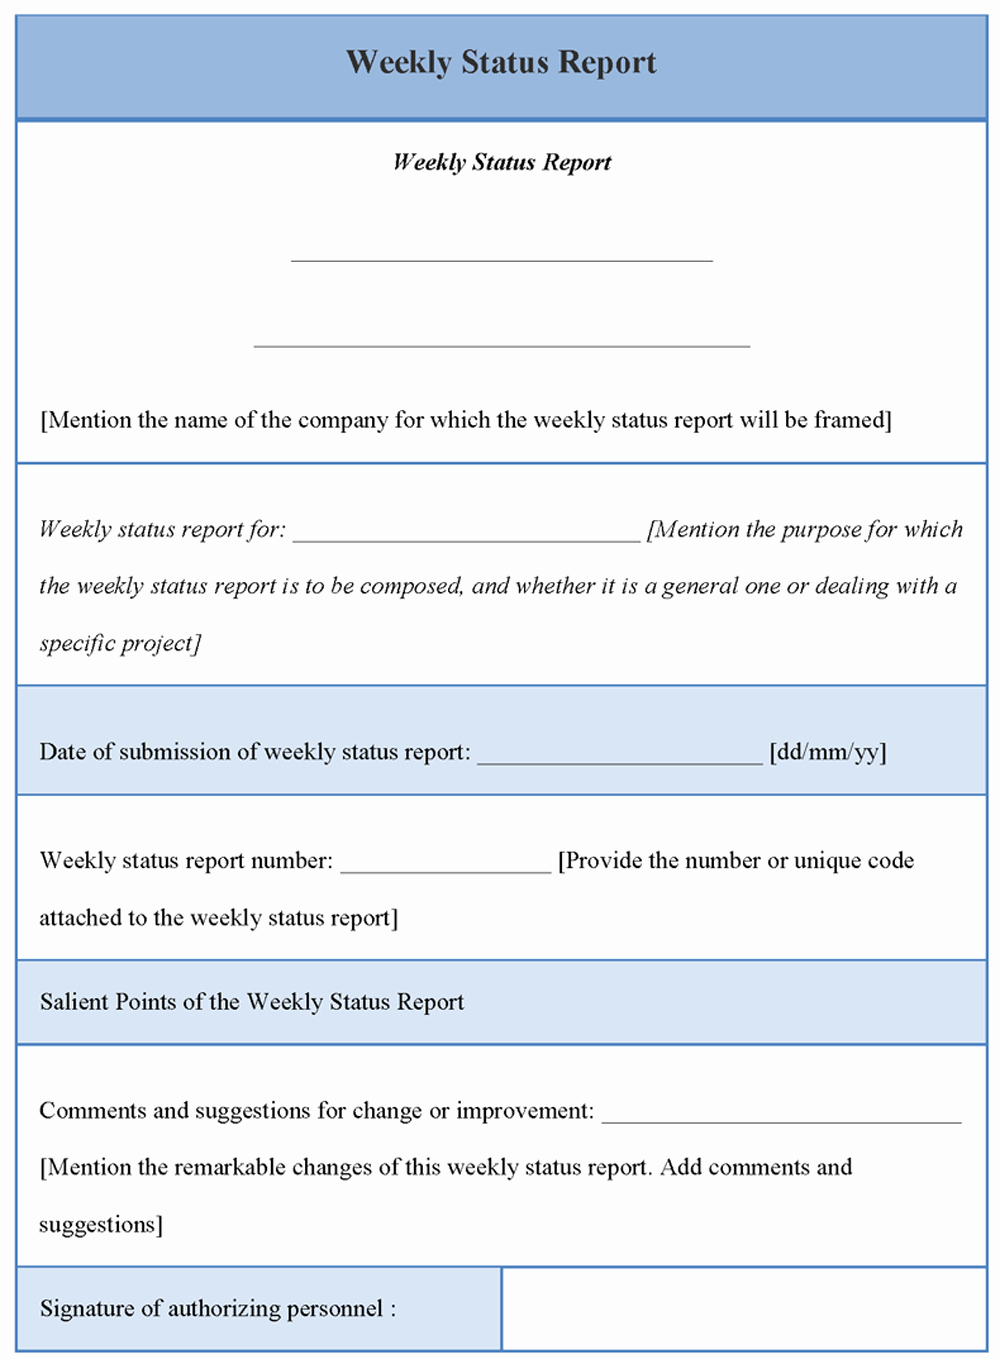 Weekly Status Report Template Fresh Report Template for Weekly Status Example Of Weekly